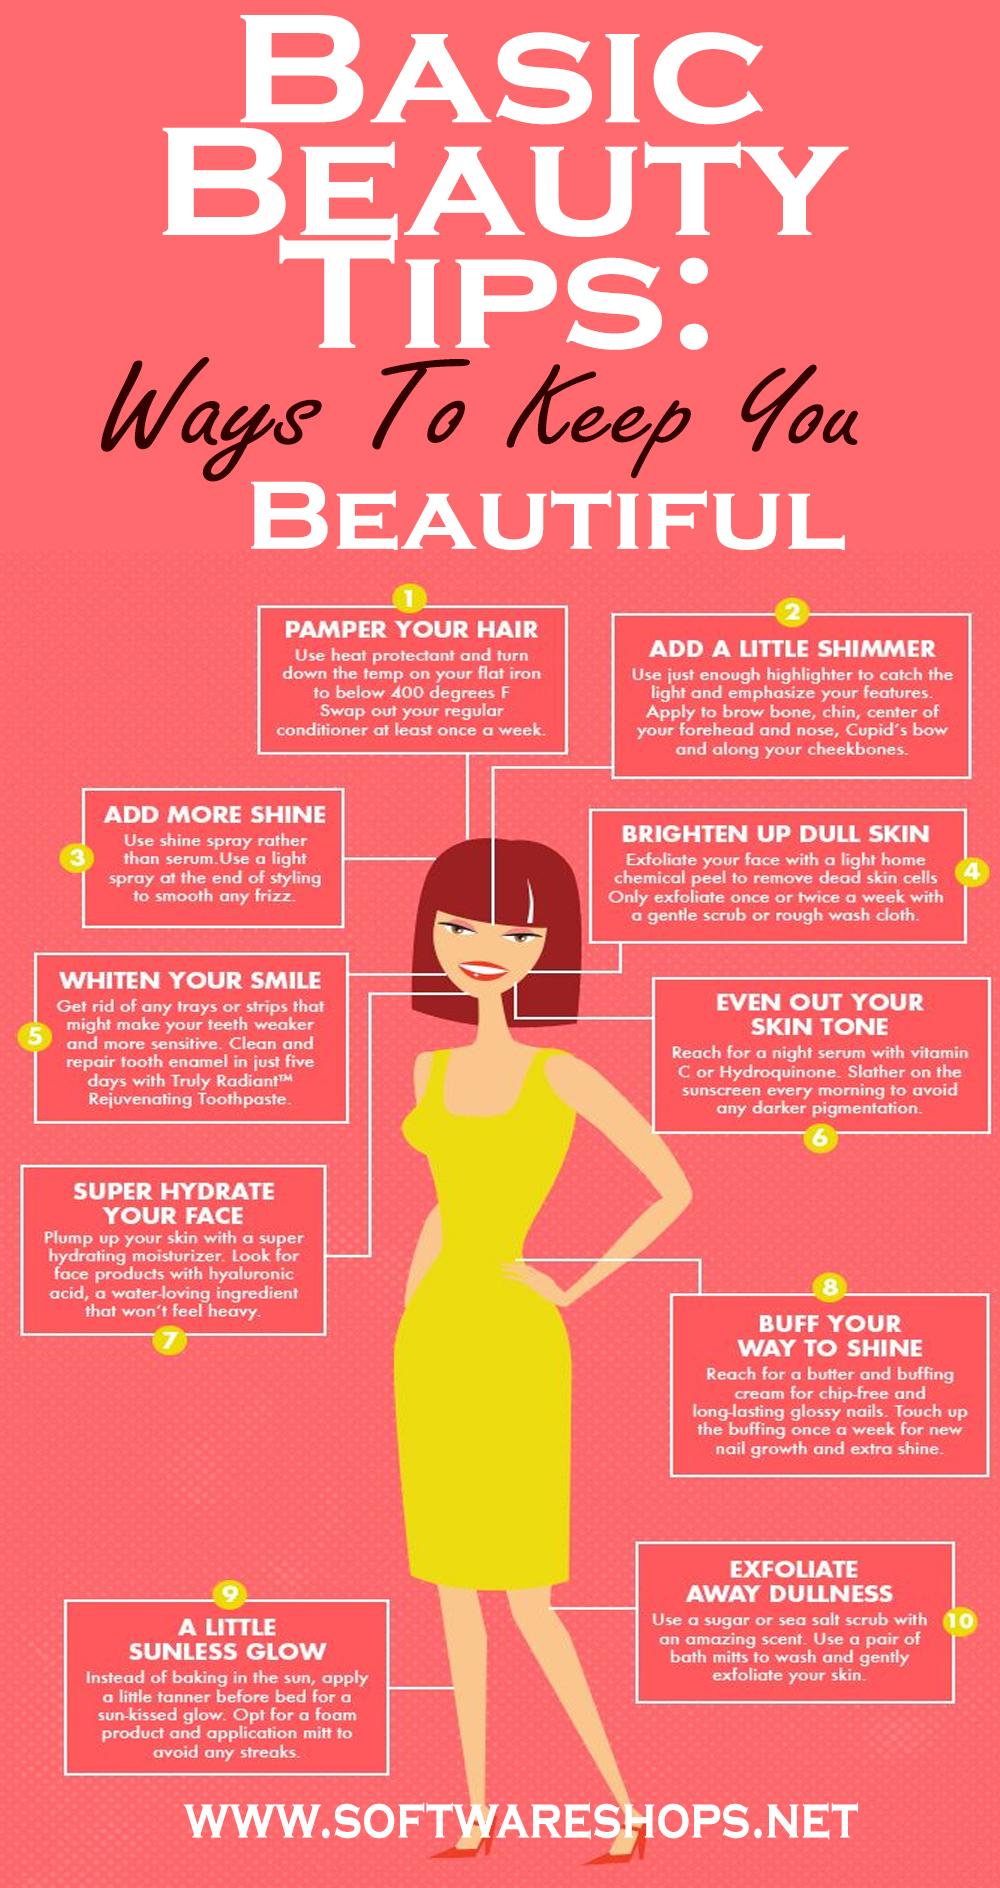 Basic Beauty Tips: Ways To Keep You Beautiful